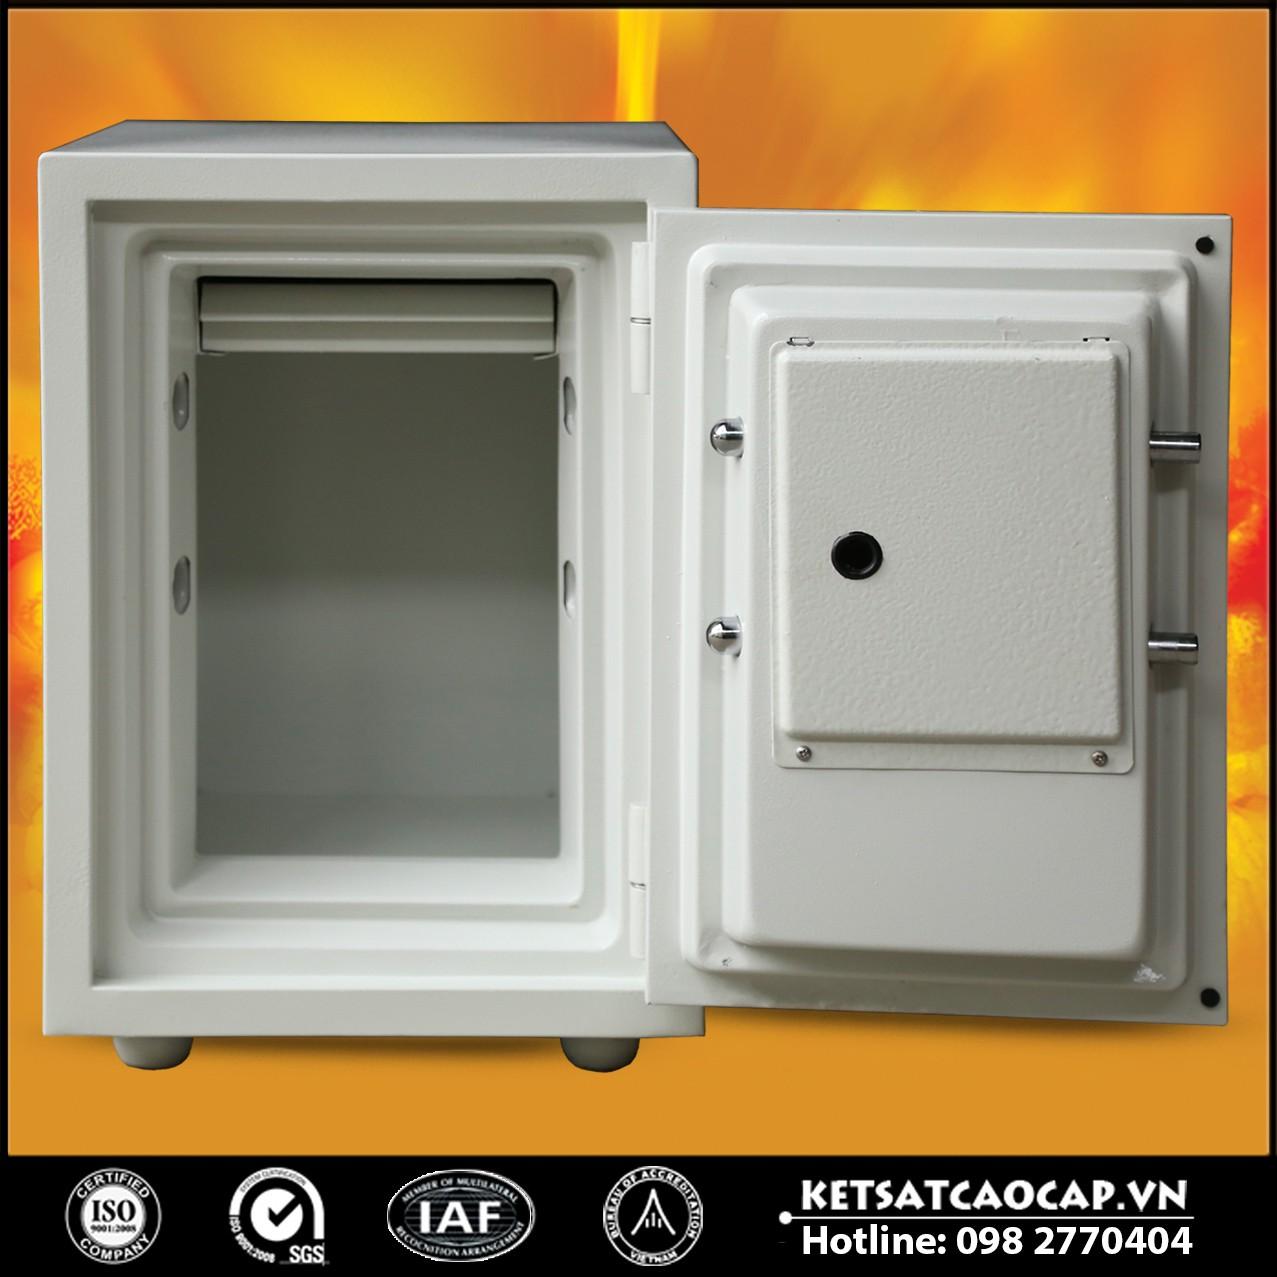 Két Sắt Công Ty KS 80D - White Led Tròn